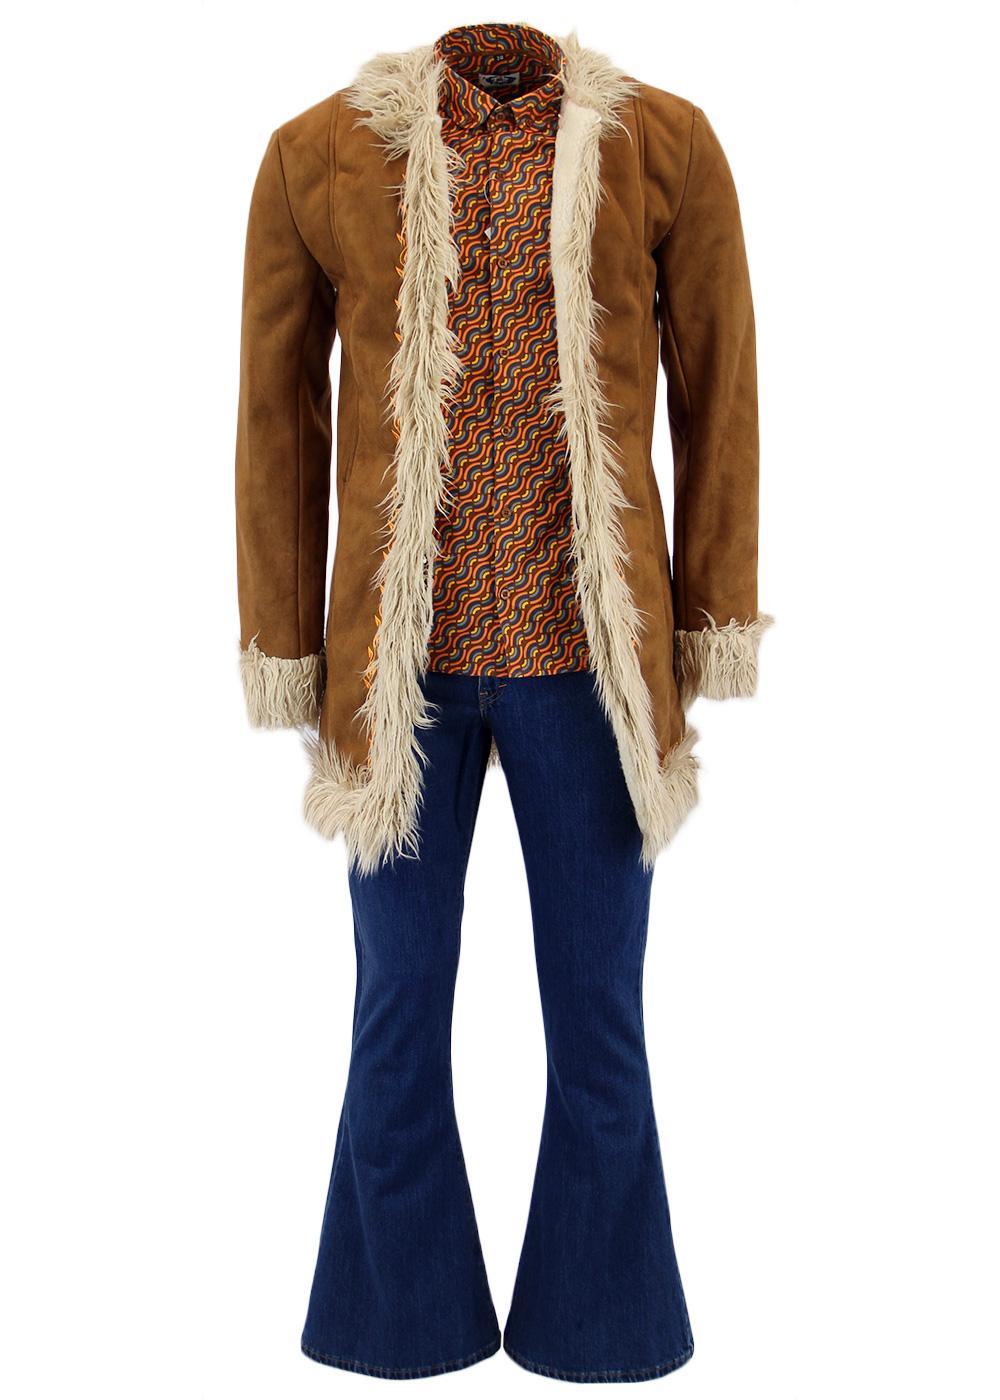 Madcap England Authentic Retro Seventies Outfit